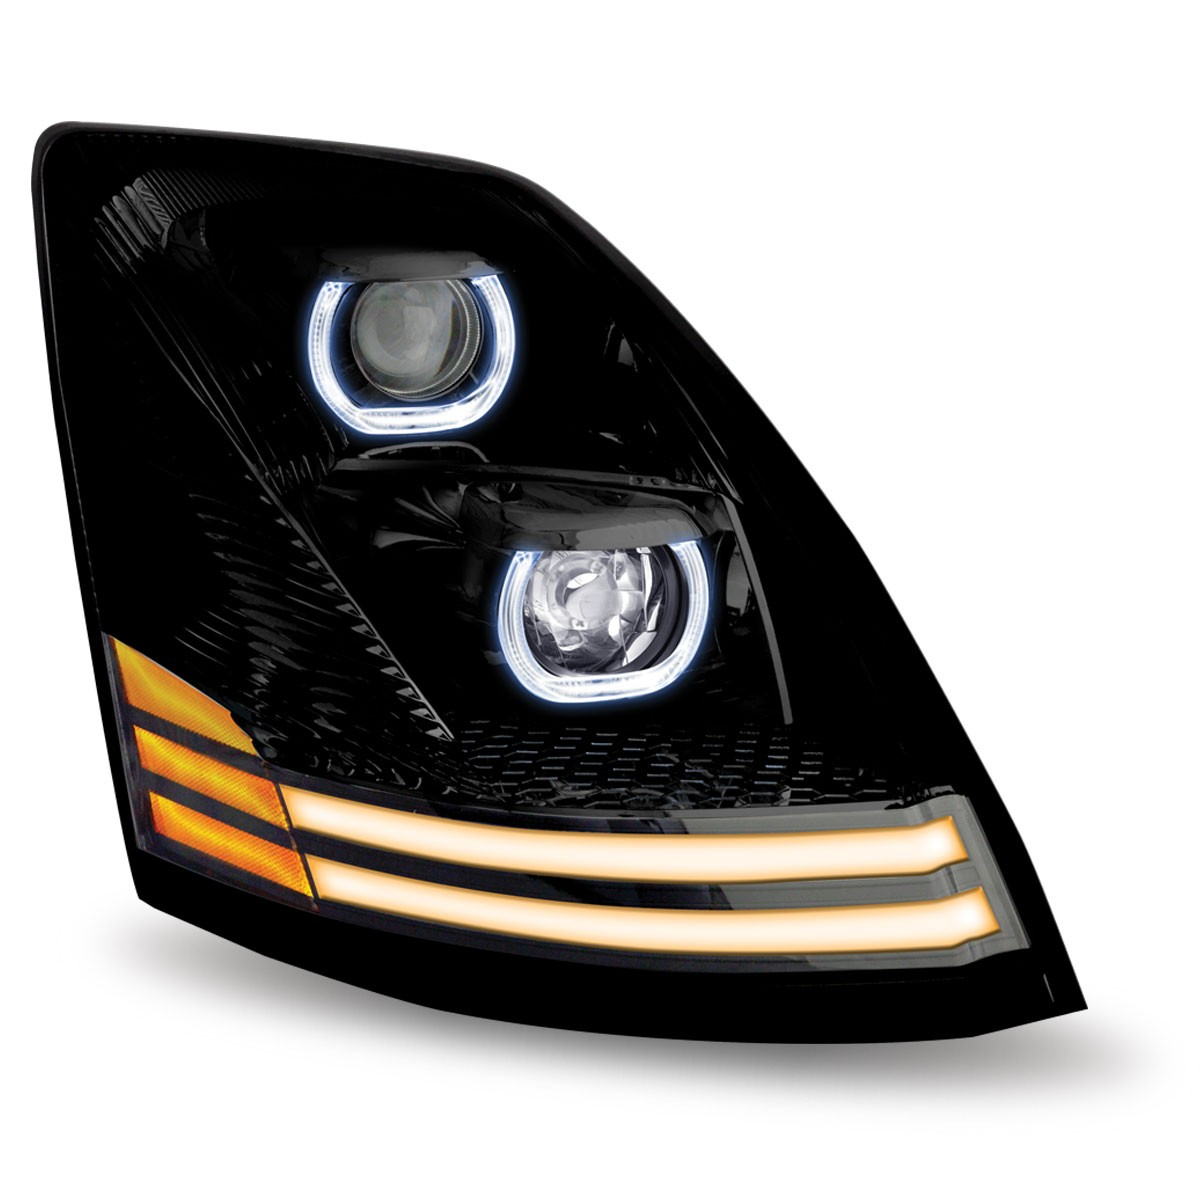 NEW 2004-2015 Volvo VN VNL VNM Truck Headlight & Fog Light ...  |Headlamp 2000 Volvo Vnl